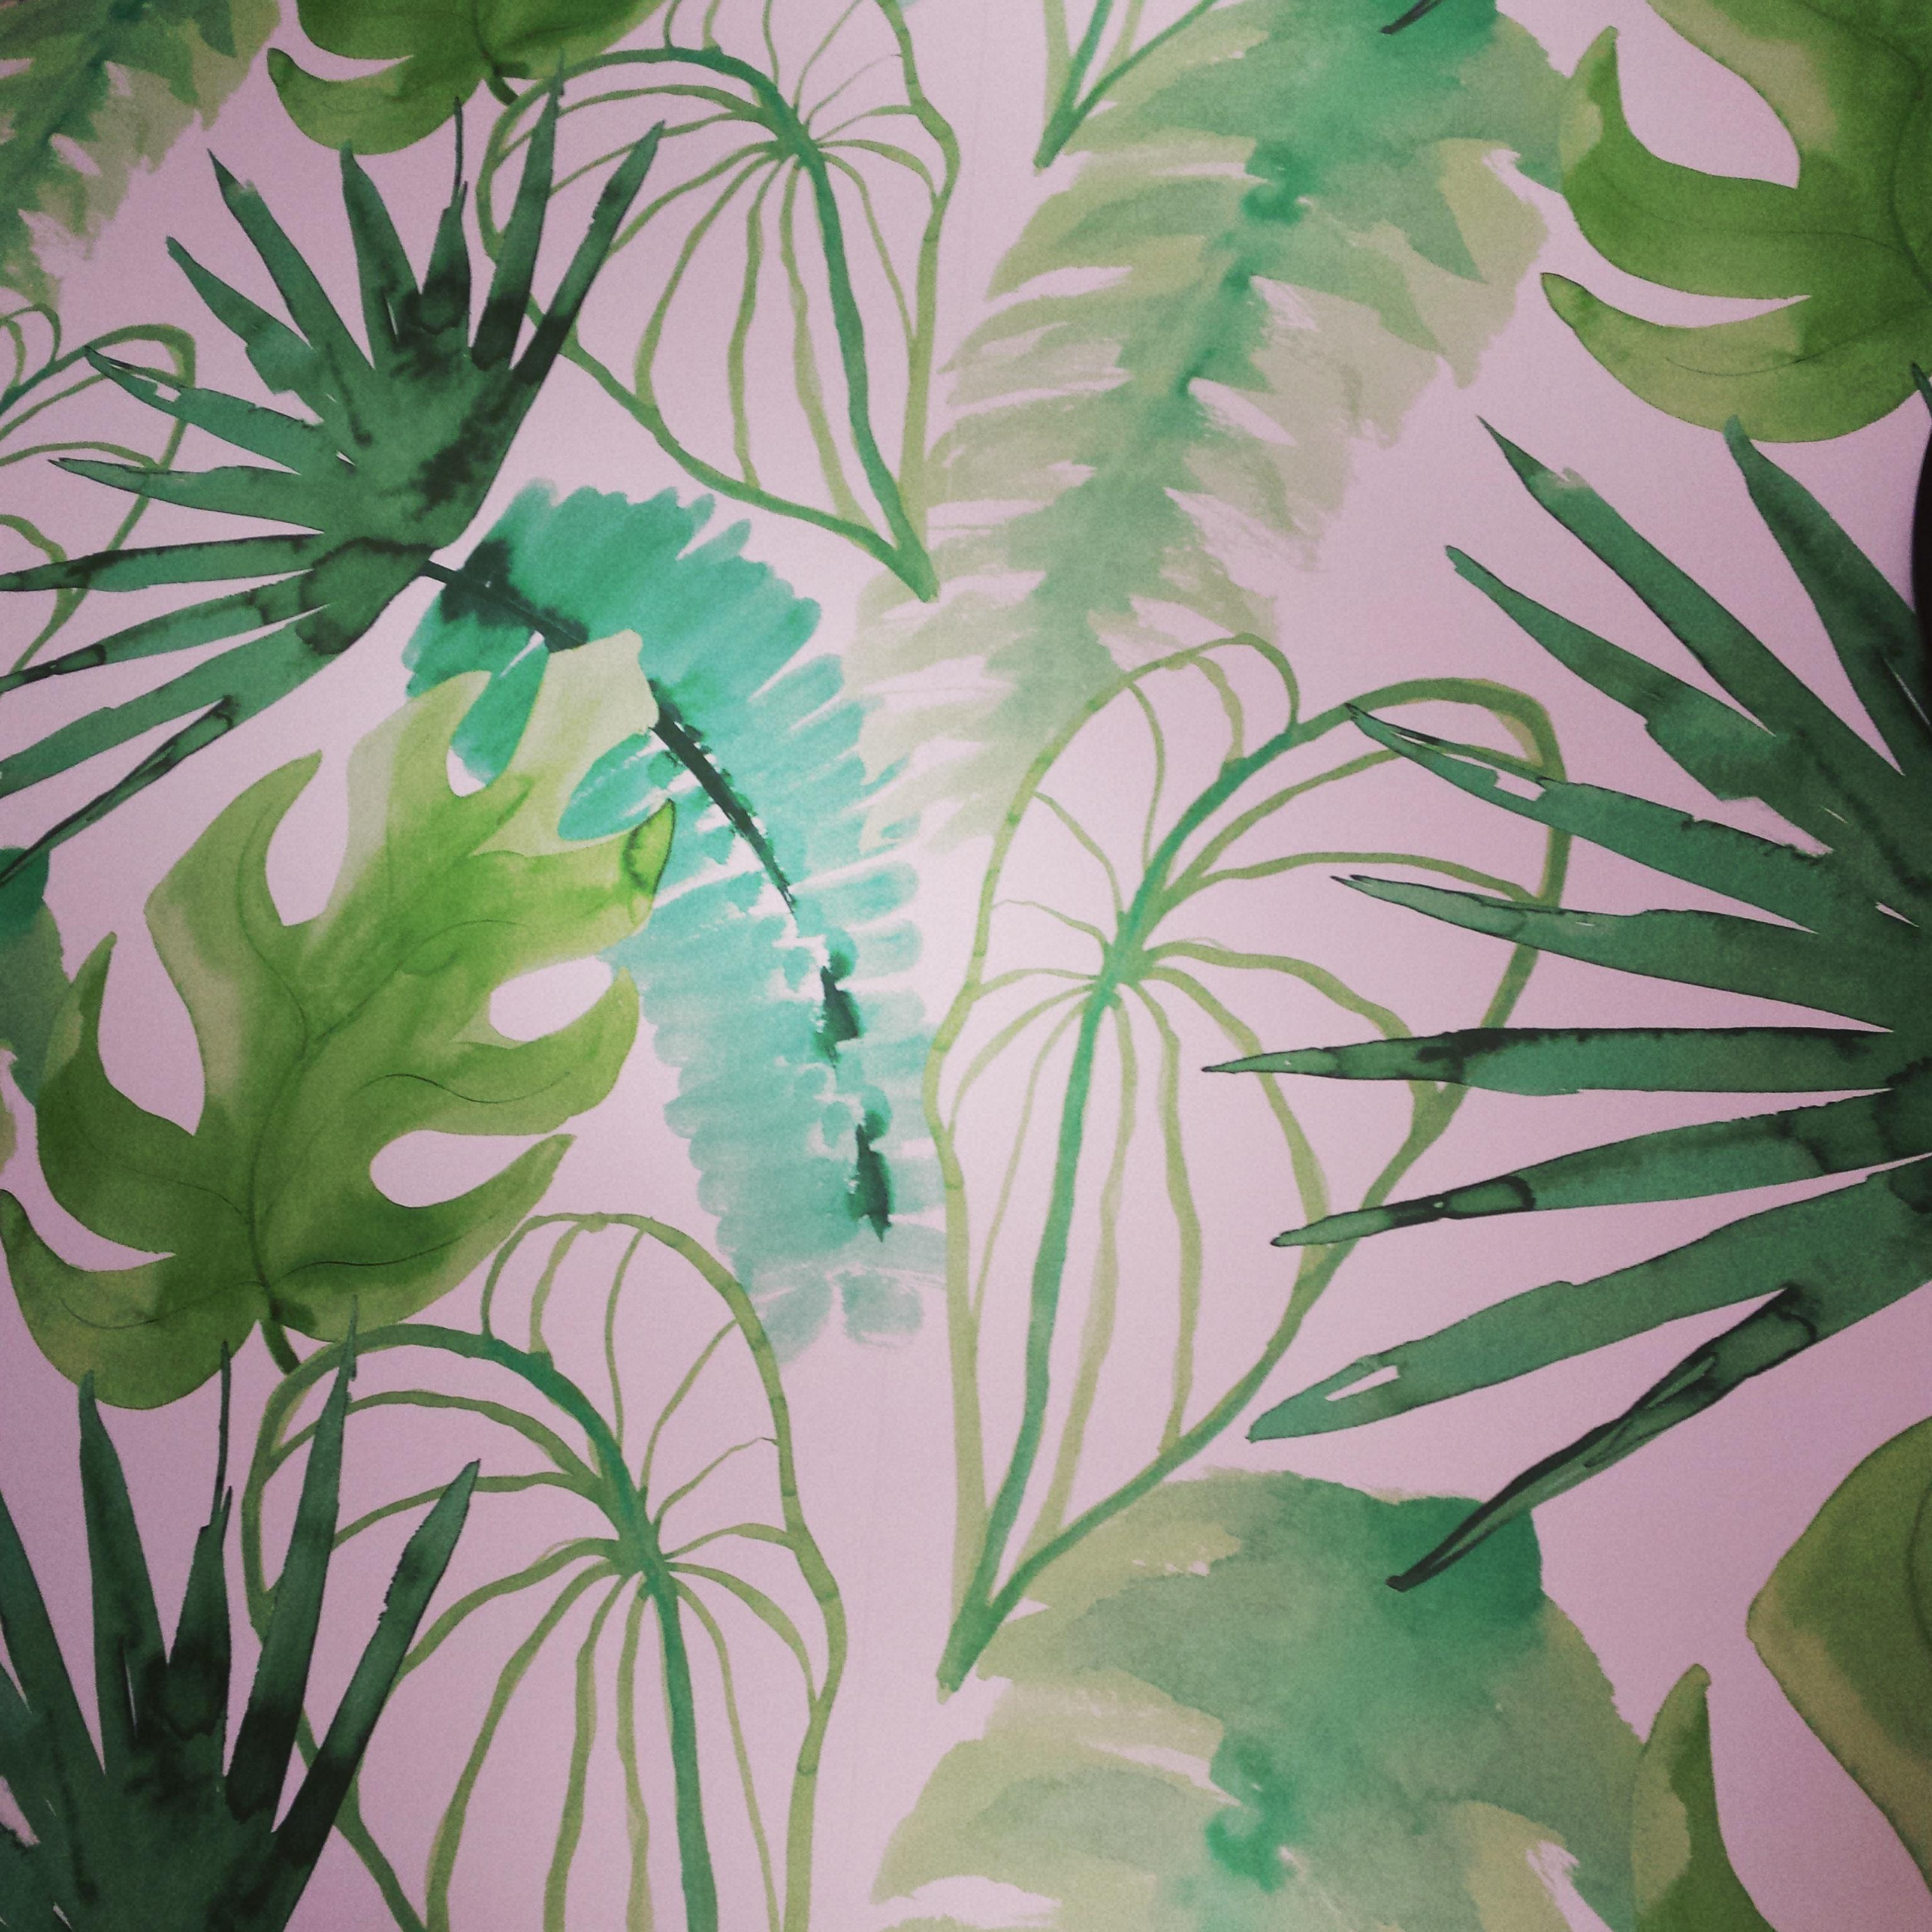 Behang Praxis Roze.Jungle Behang Kwantum